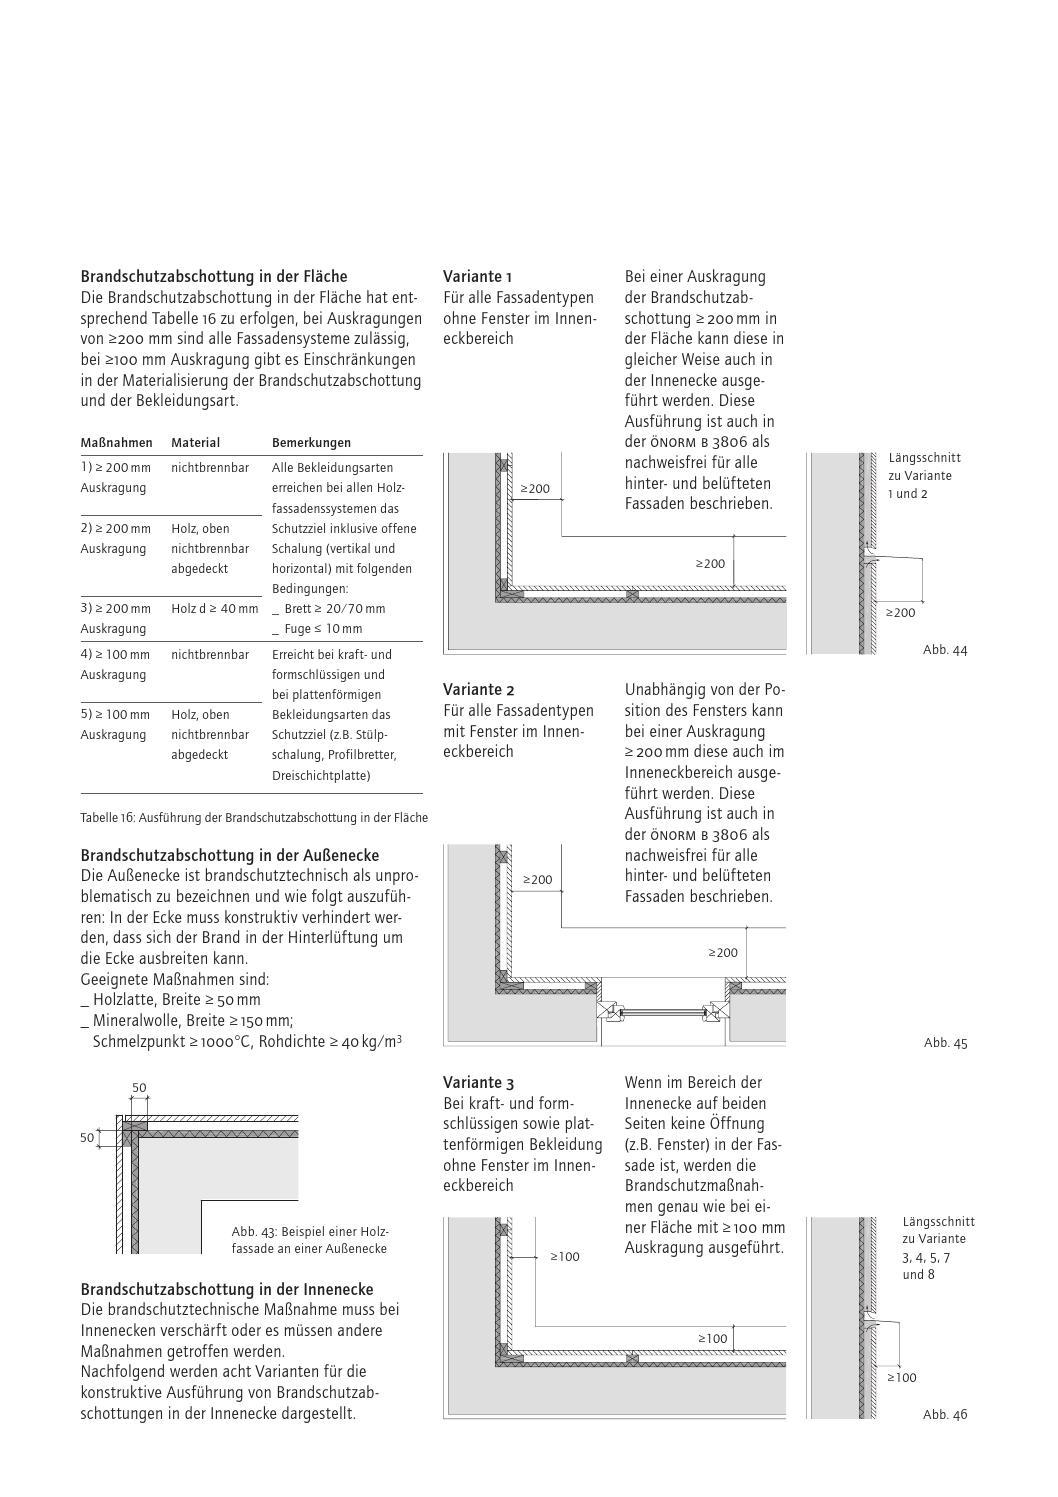 Bevorzugt Fassaden aus Holz (proHolz Austria) by DETAIL - issuu NS34